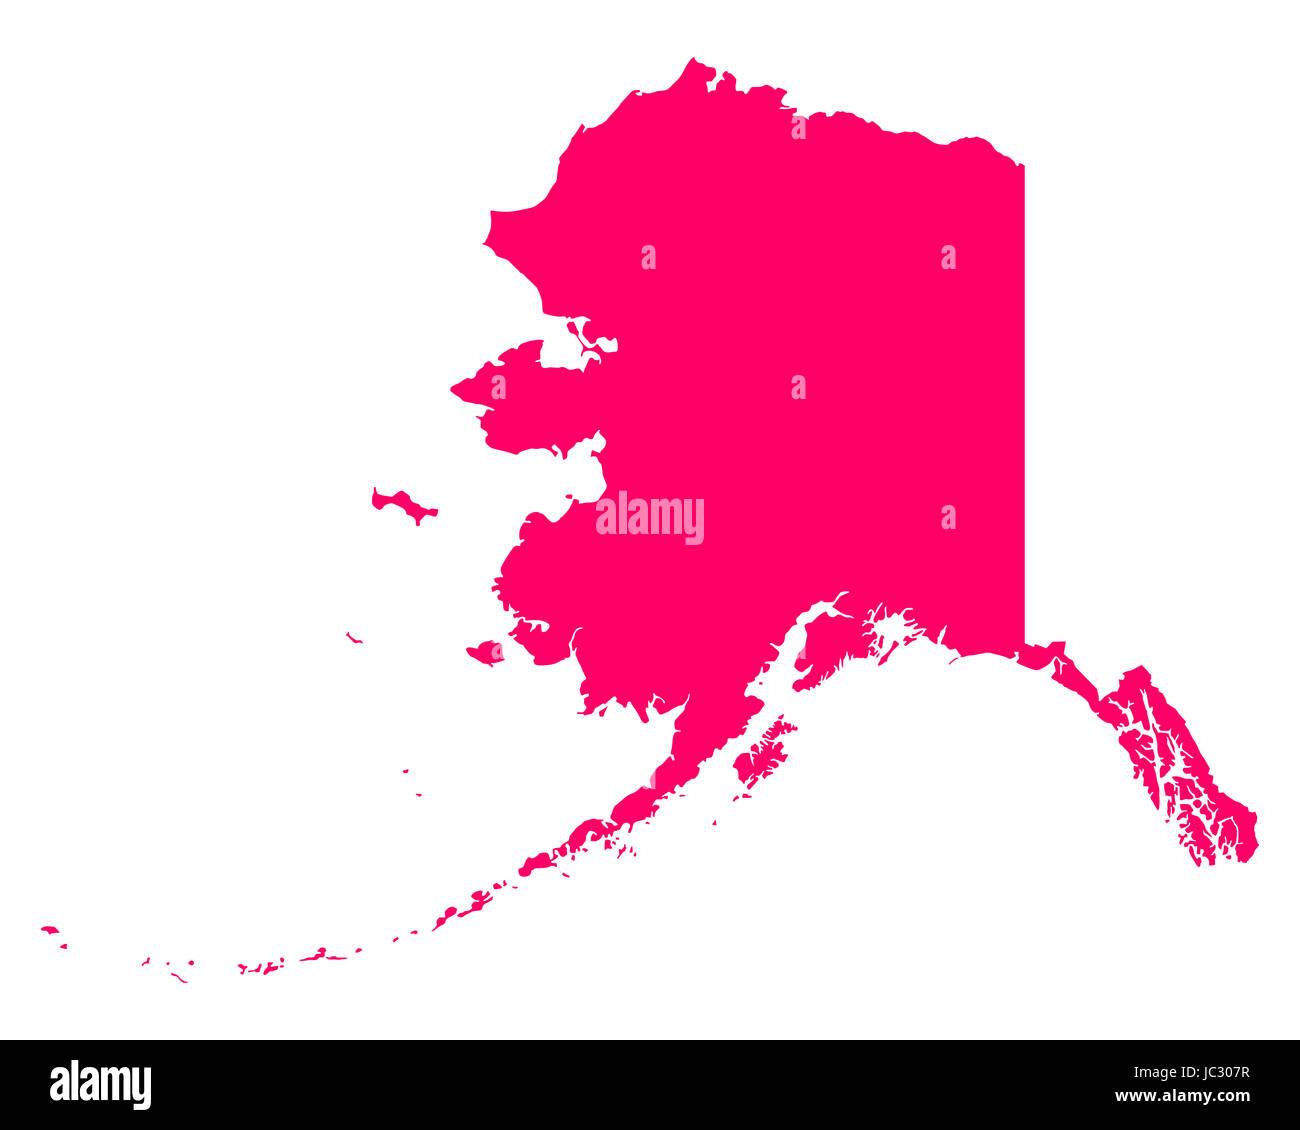 Karte von Alaska - Stock Image